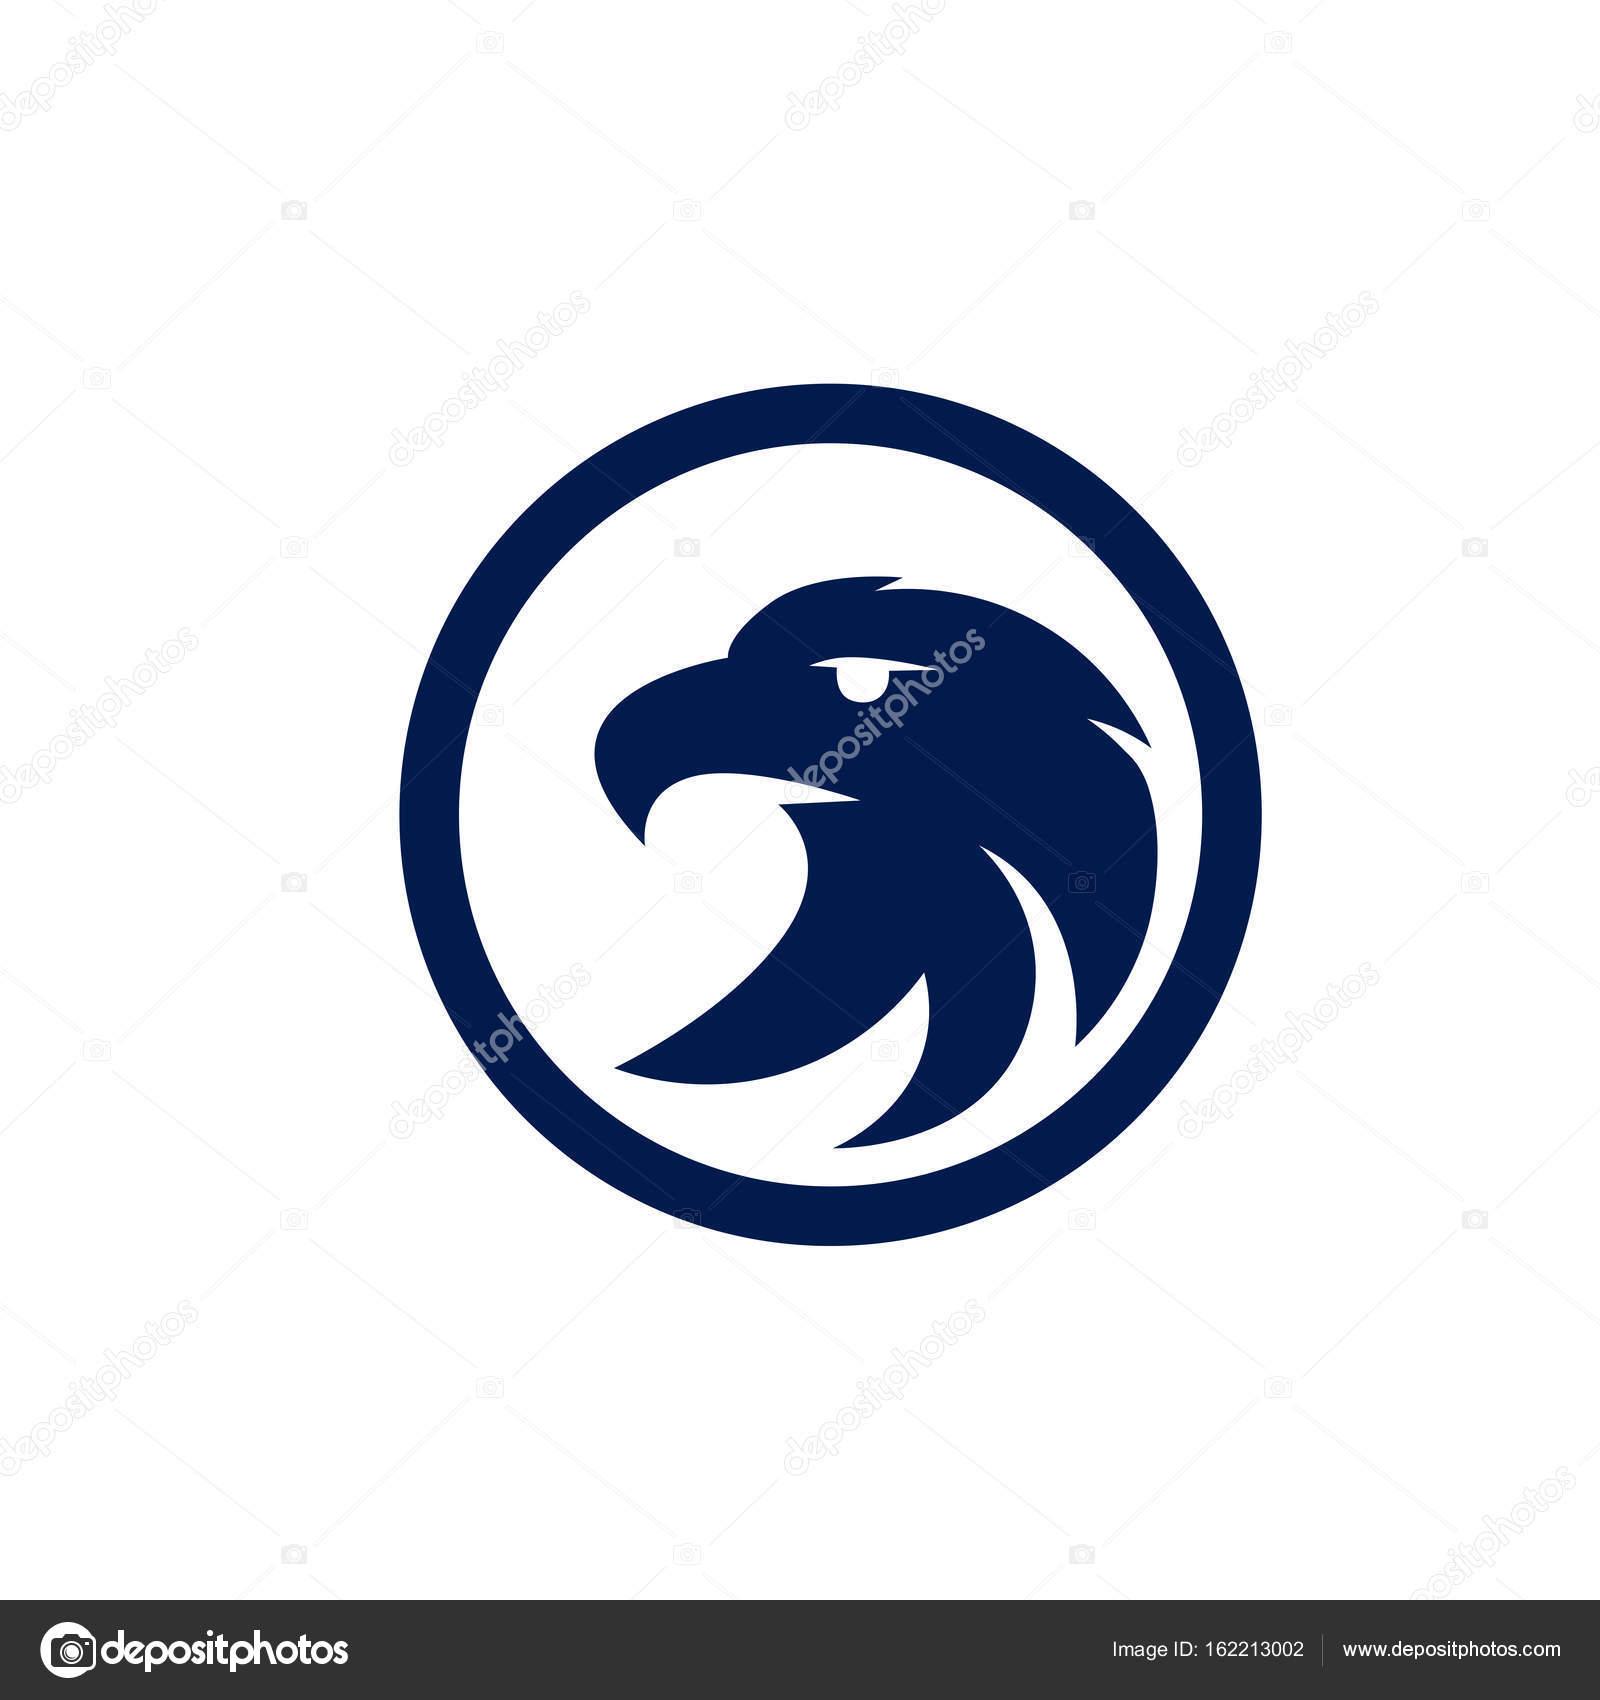 Eagle vector logo template stock vector dikiykachap1 162213002 eagle icon symbol of eagle hawk predator for sport team mascot company badge guard service hunting club label vector by dikiykachap1 biocorpaavc Images